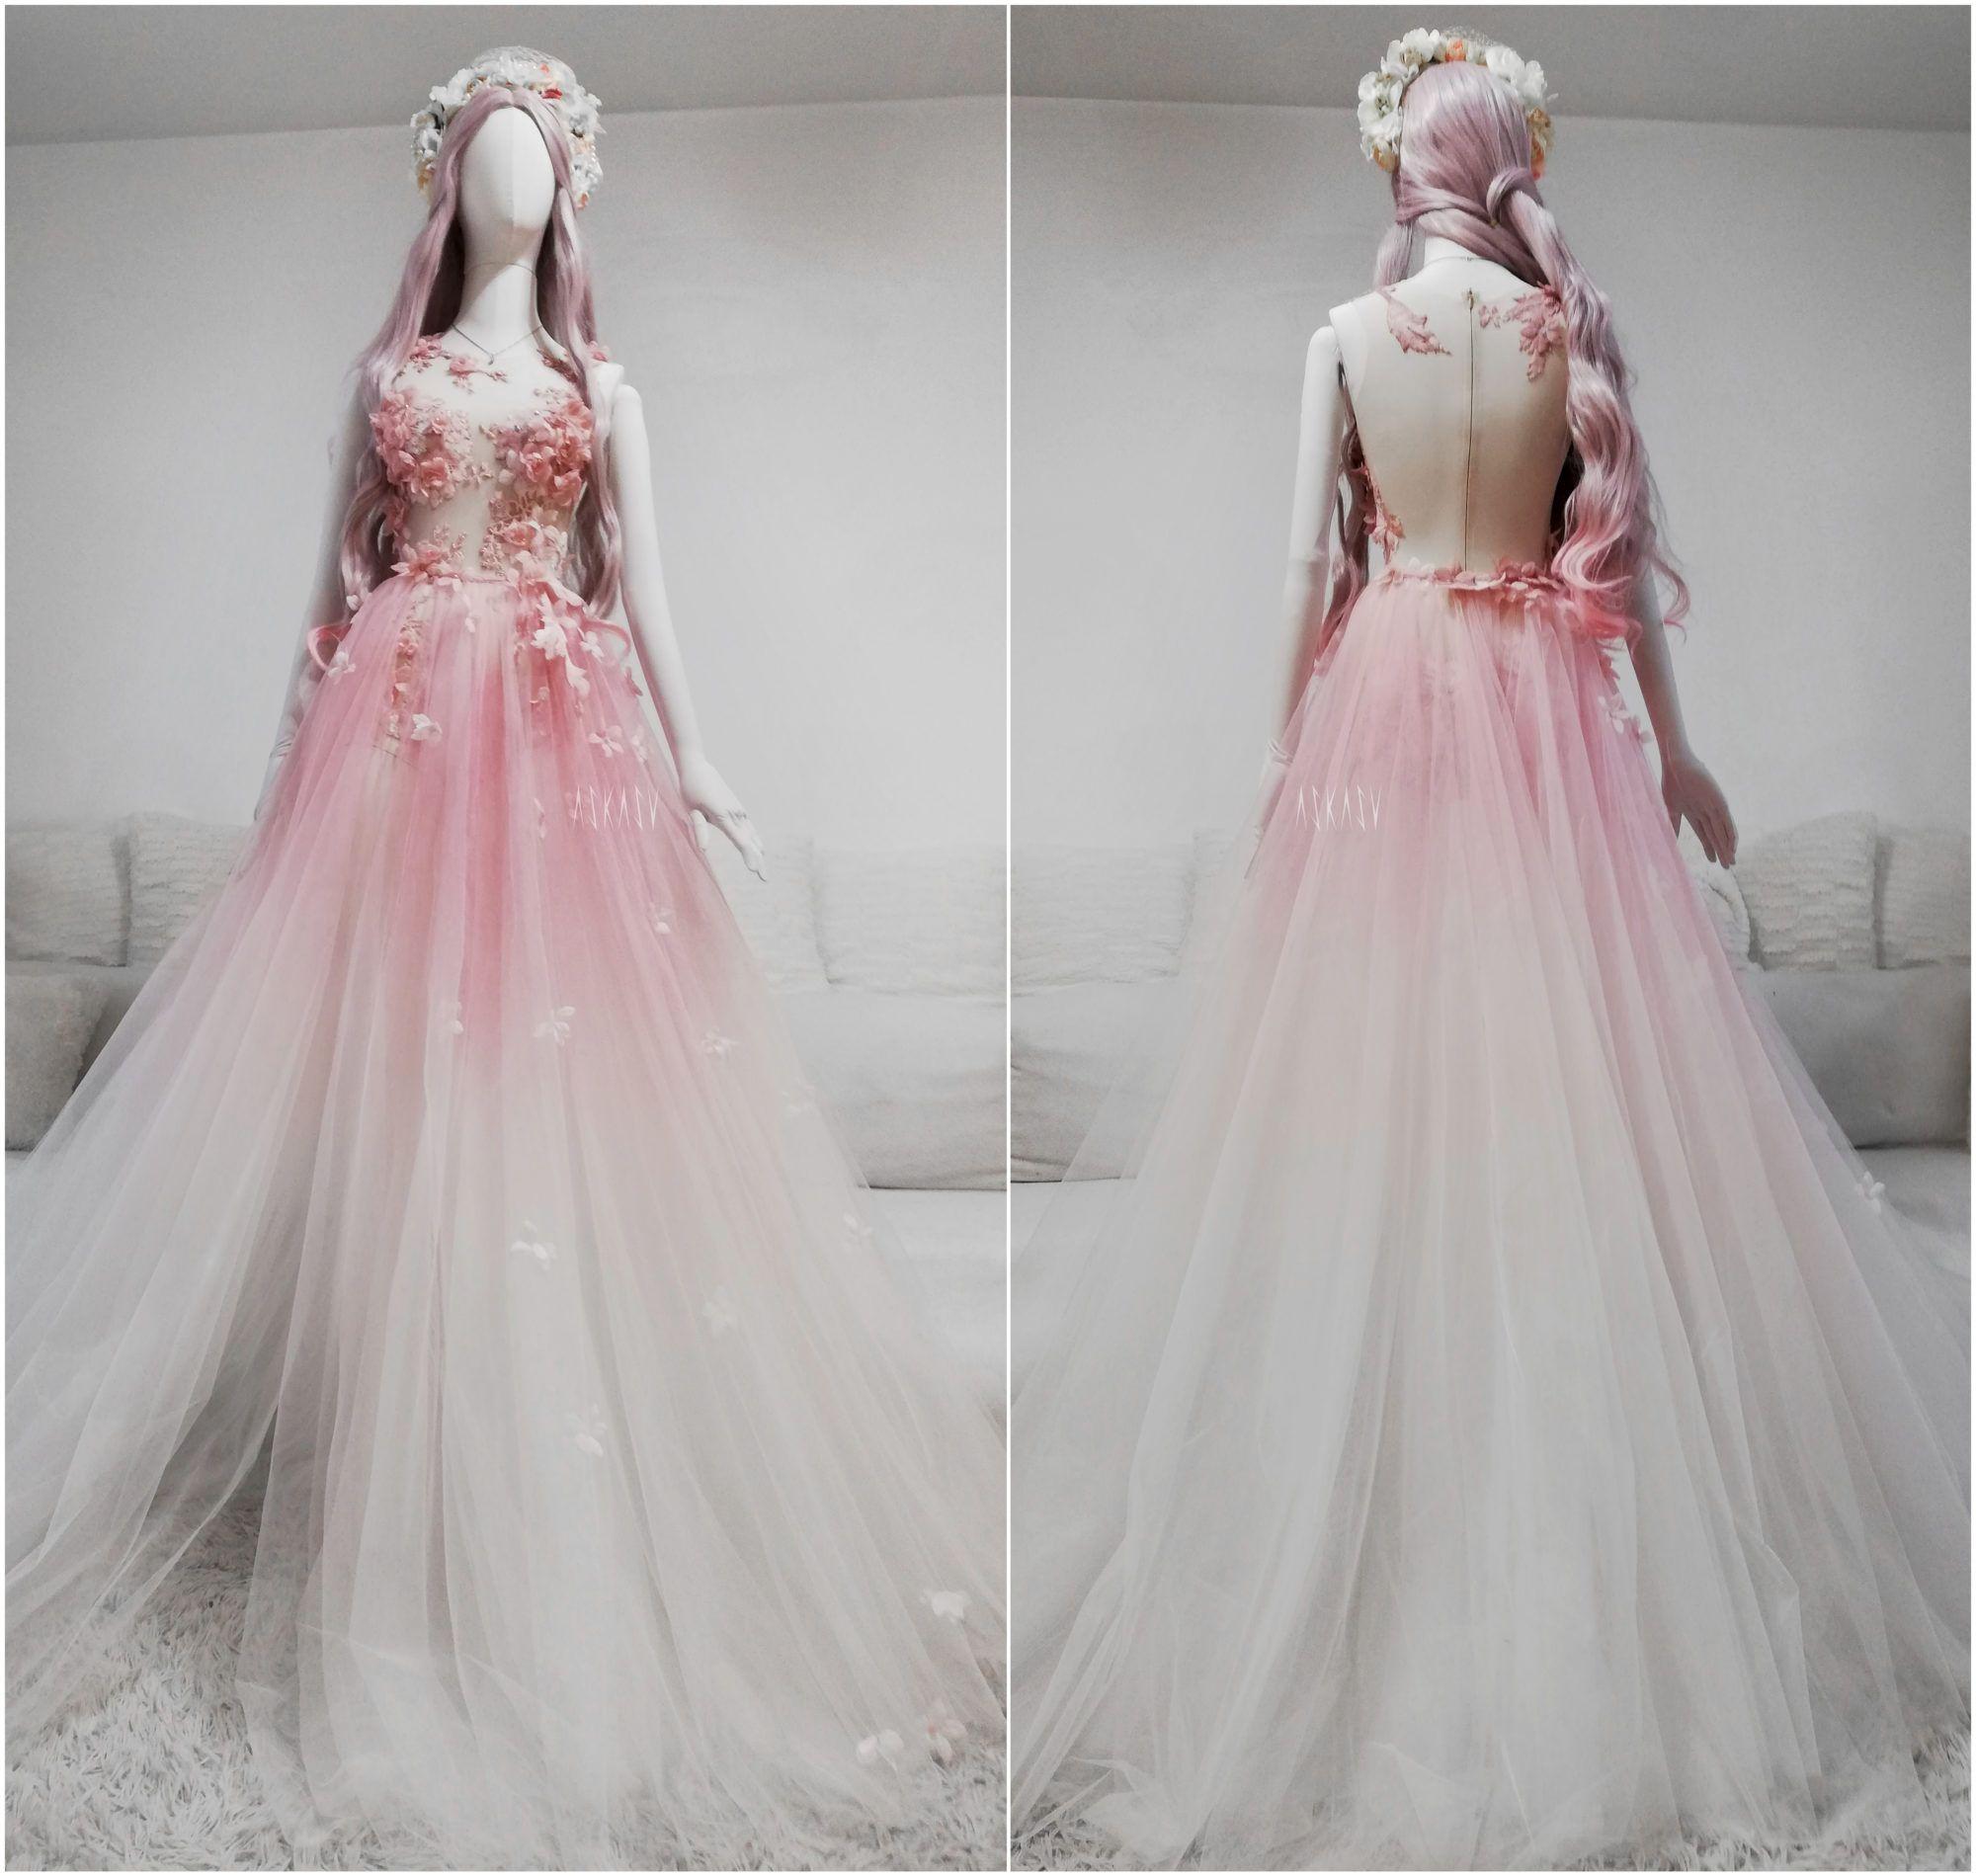 48+ Cherry blossom dress ideas in 2021